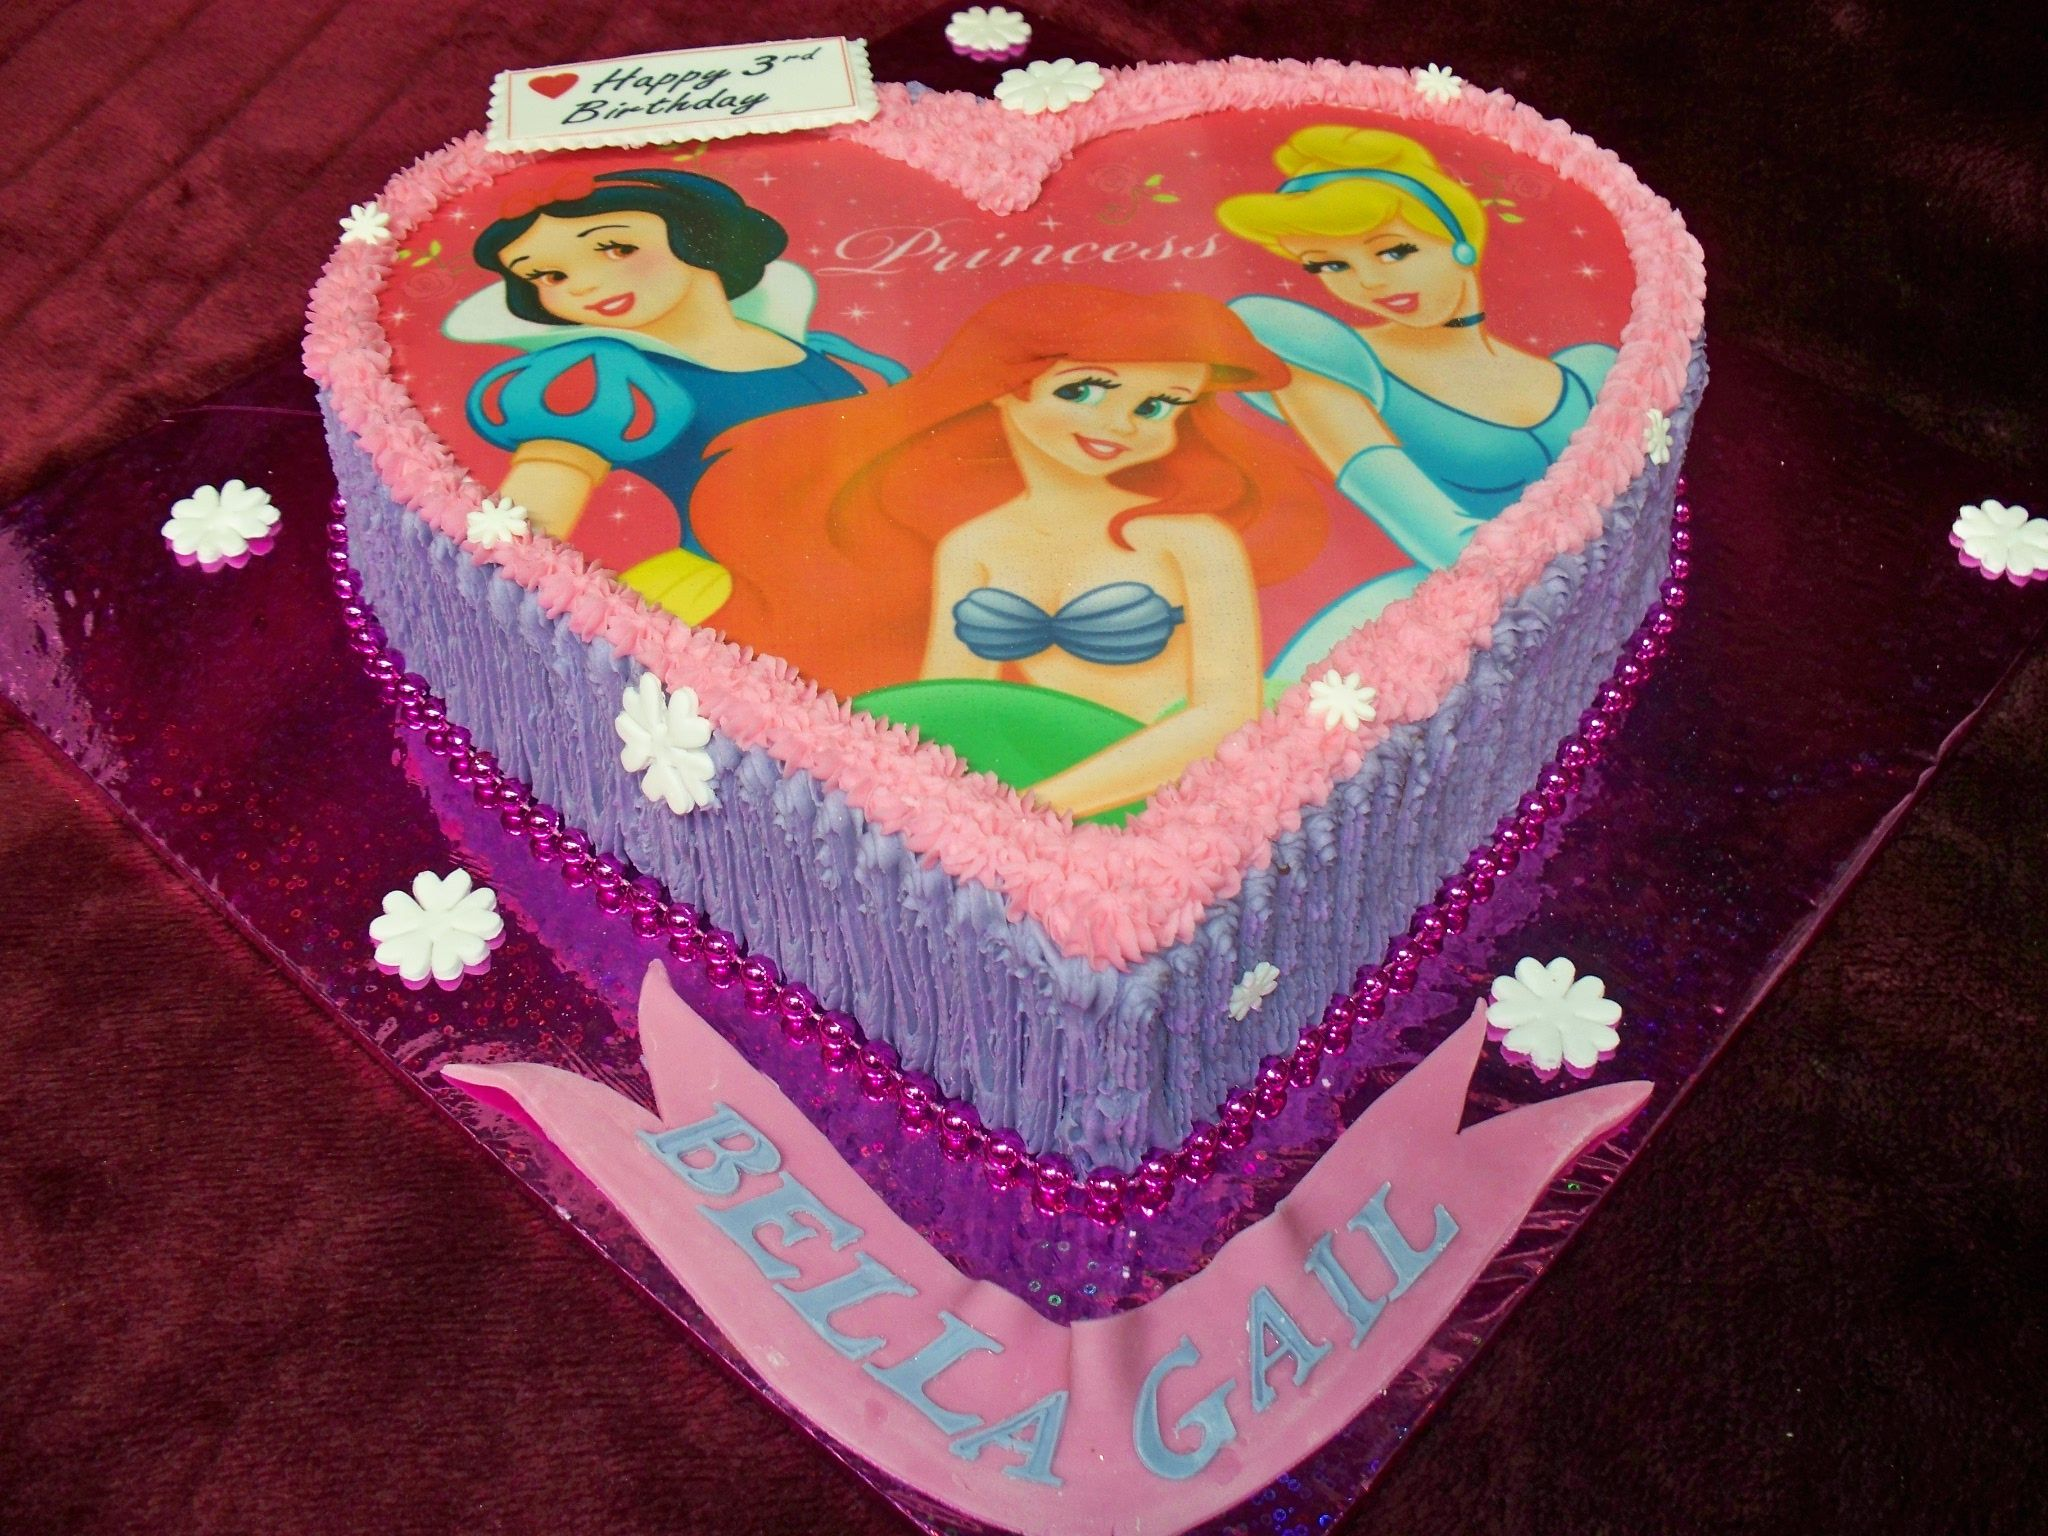 Disney Princess Birthday cake Auckland New Zealand FRESCO FOODS